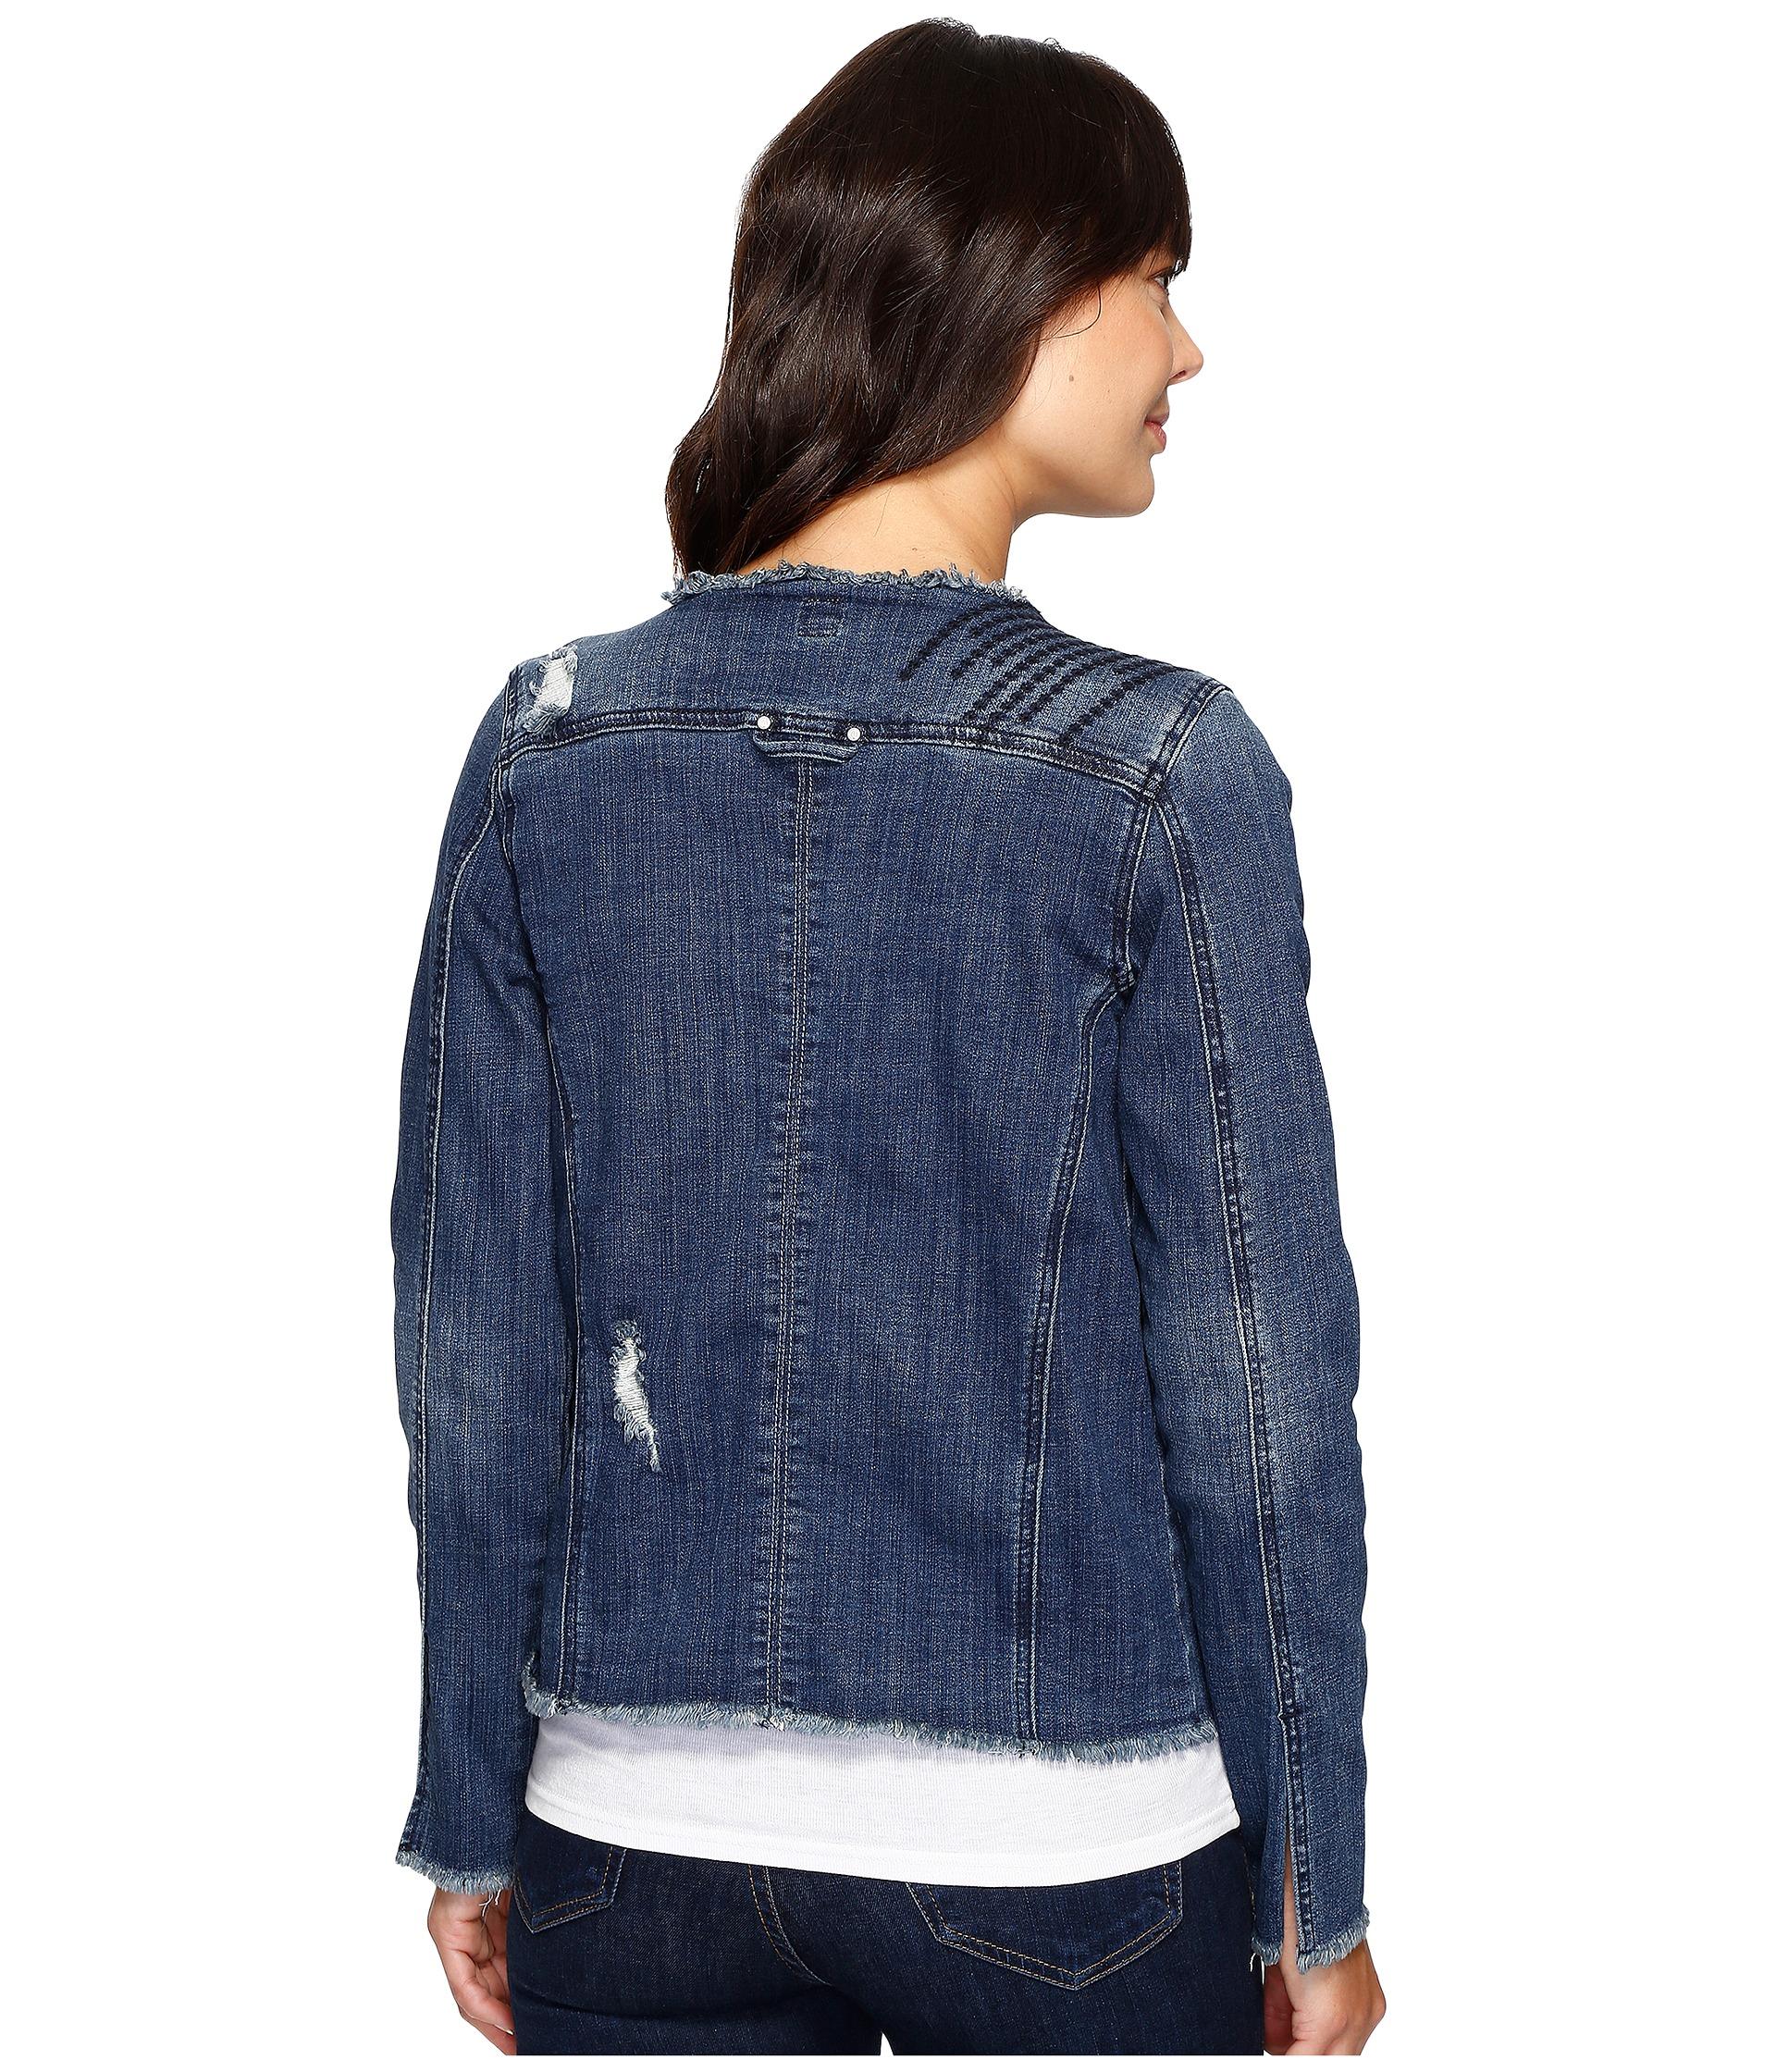 Jag Jeans Lori Jacket in Thorne Blue Crosshatch Denim Thorne Blue - Zappos.com Free Shipping ...